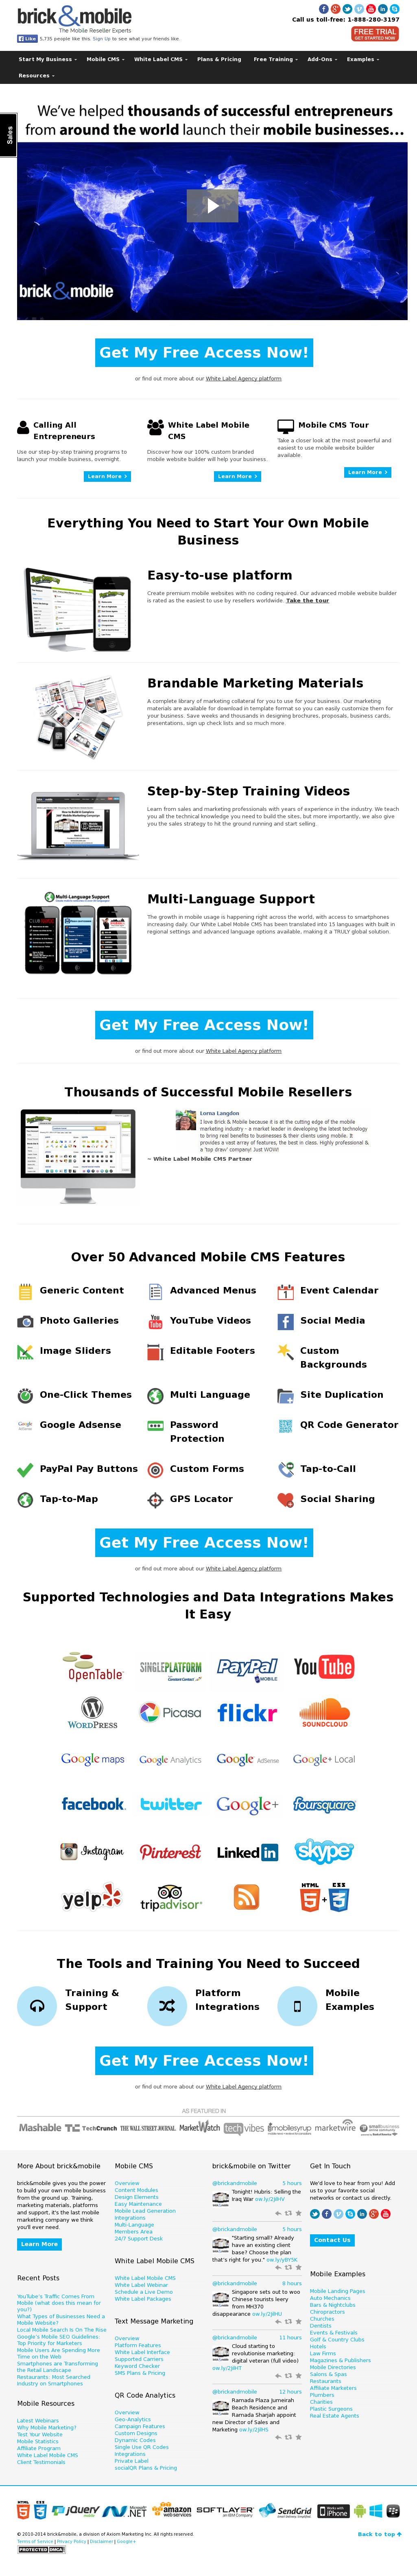 Brick&Mobile Competitors, Revenue and Employees - Owler Company Profile